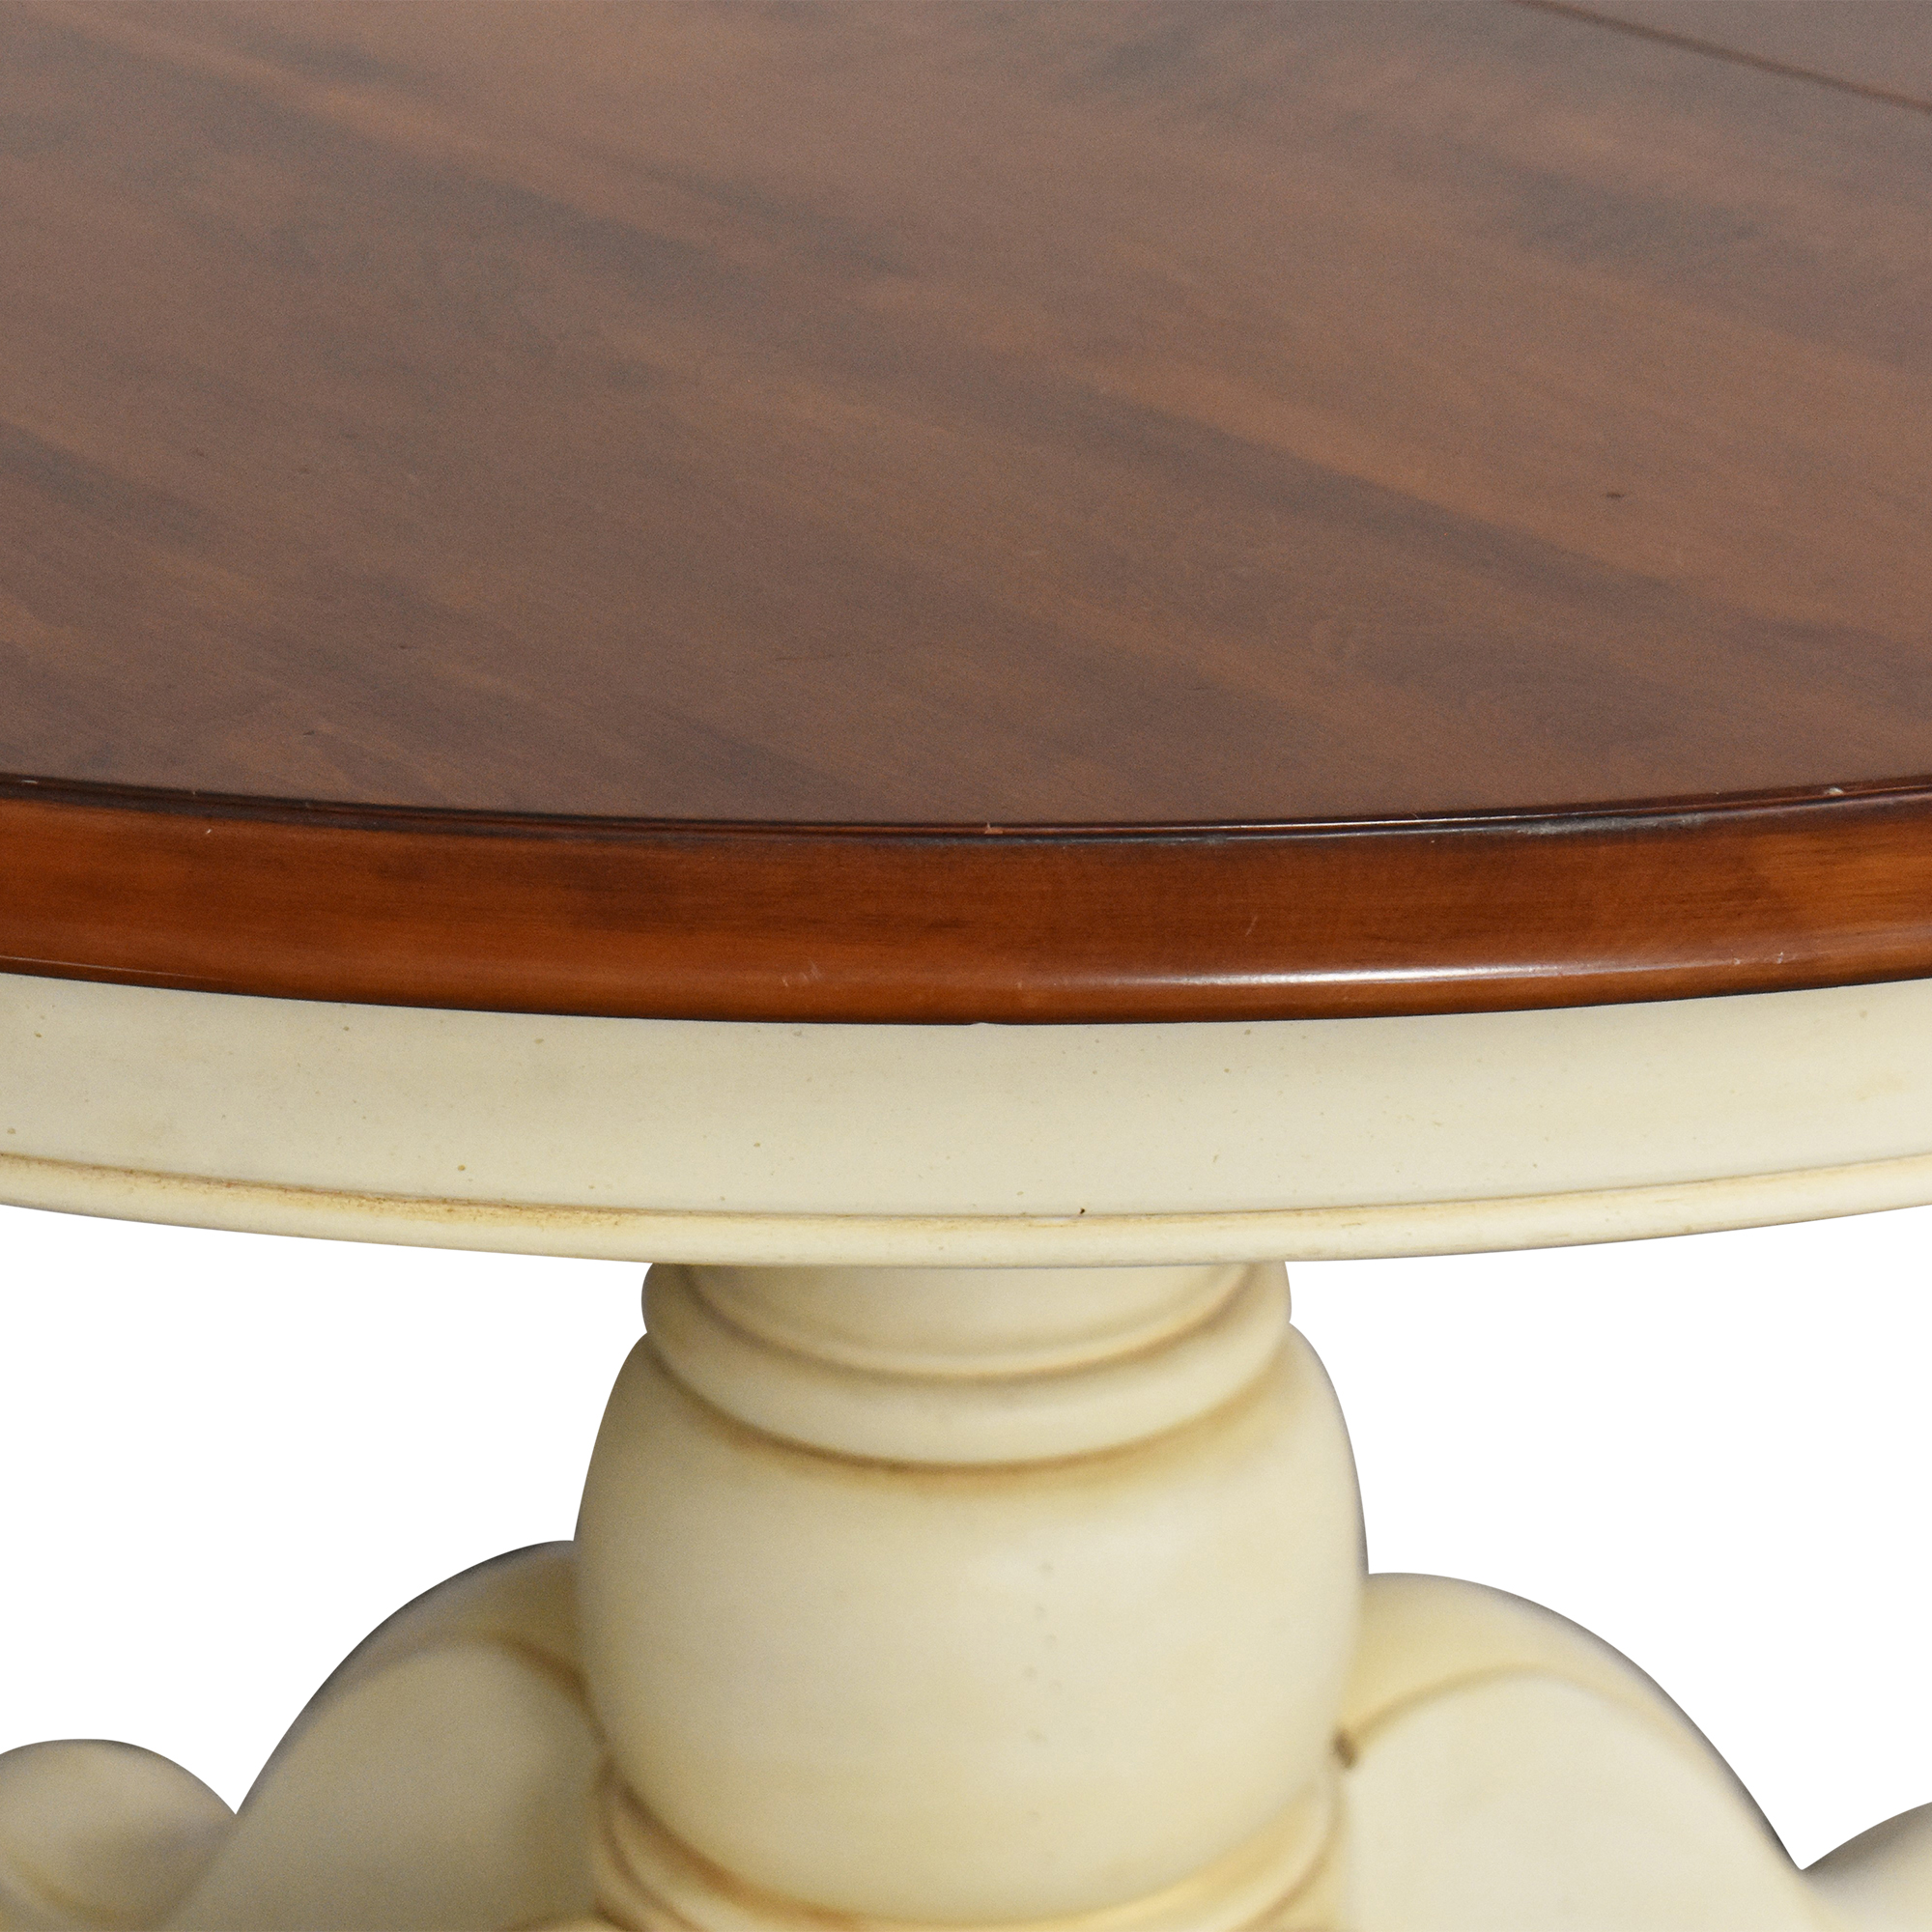 Ethan Allen Ethan Allen Extendable Farmhouse Dining Table dimensions